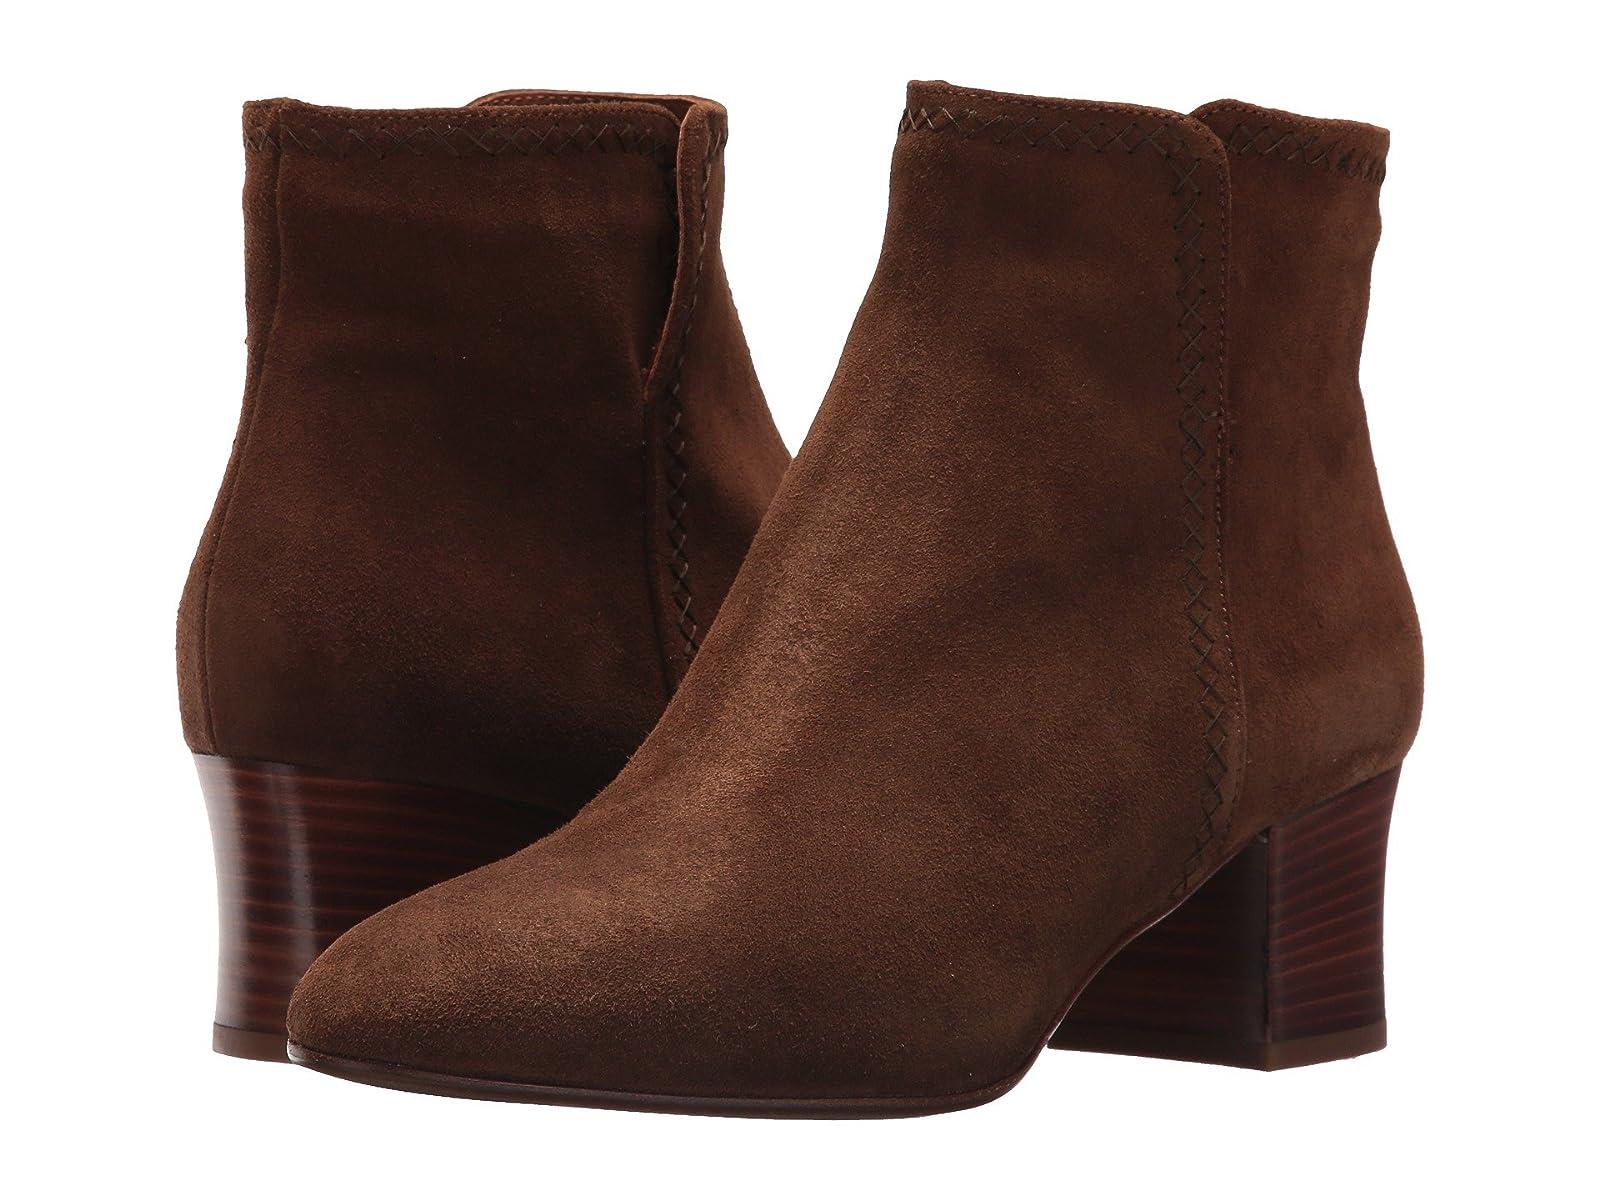 Aquatalia FlorineCheap and distinctive eye-catching shoes